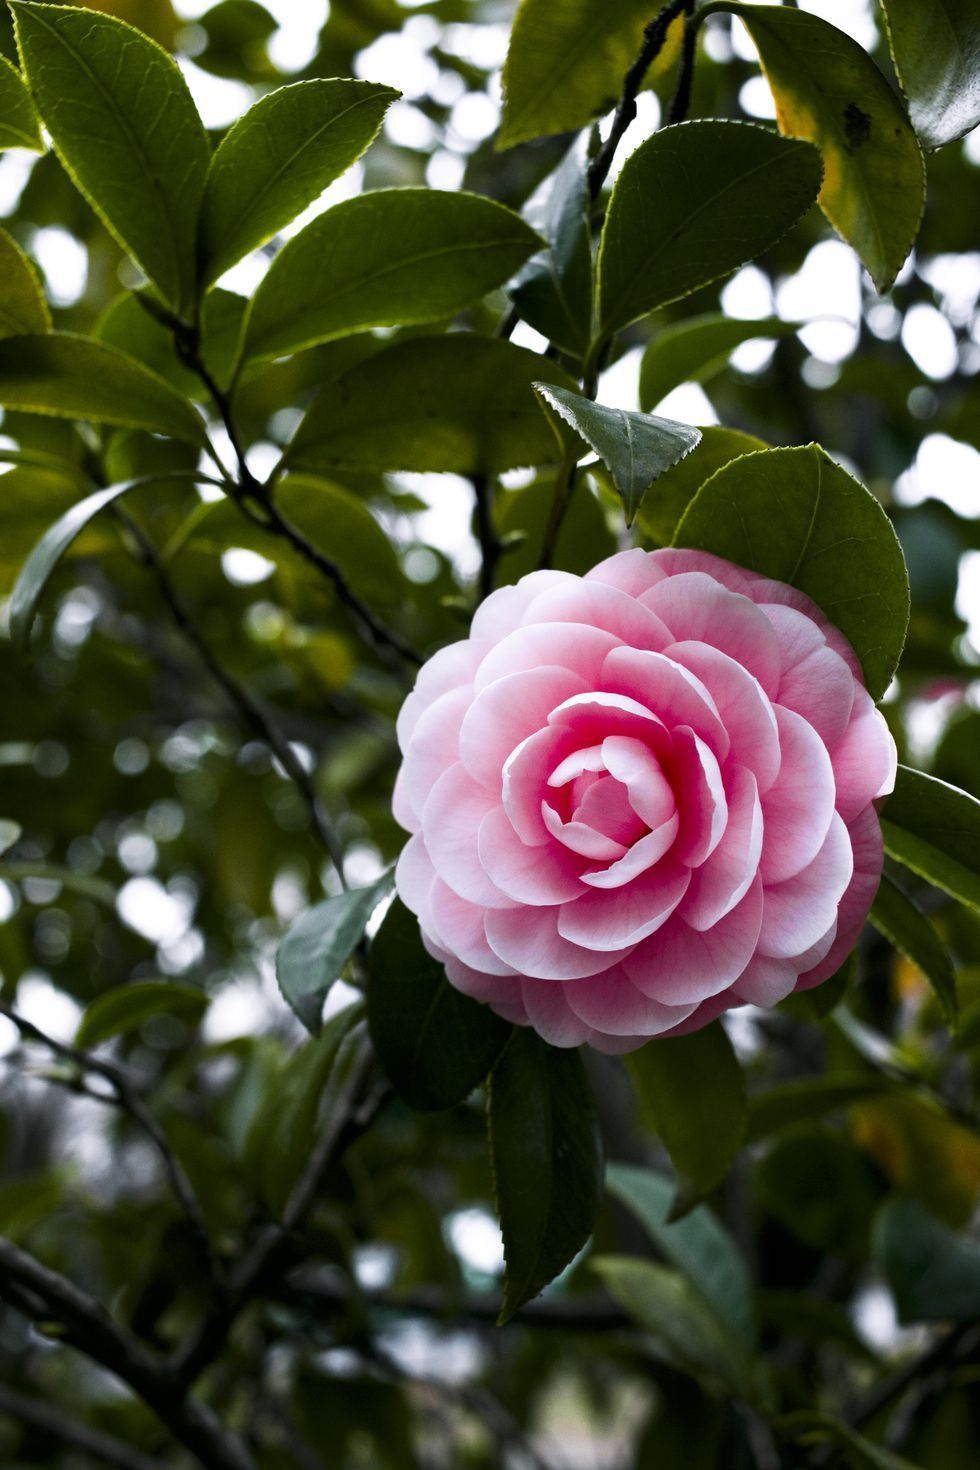 Pink Camellia Flower Winter Flowers Garden Winter Flowers Beautiful Flowers Garden